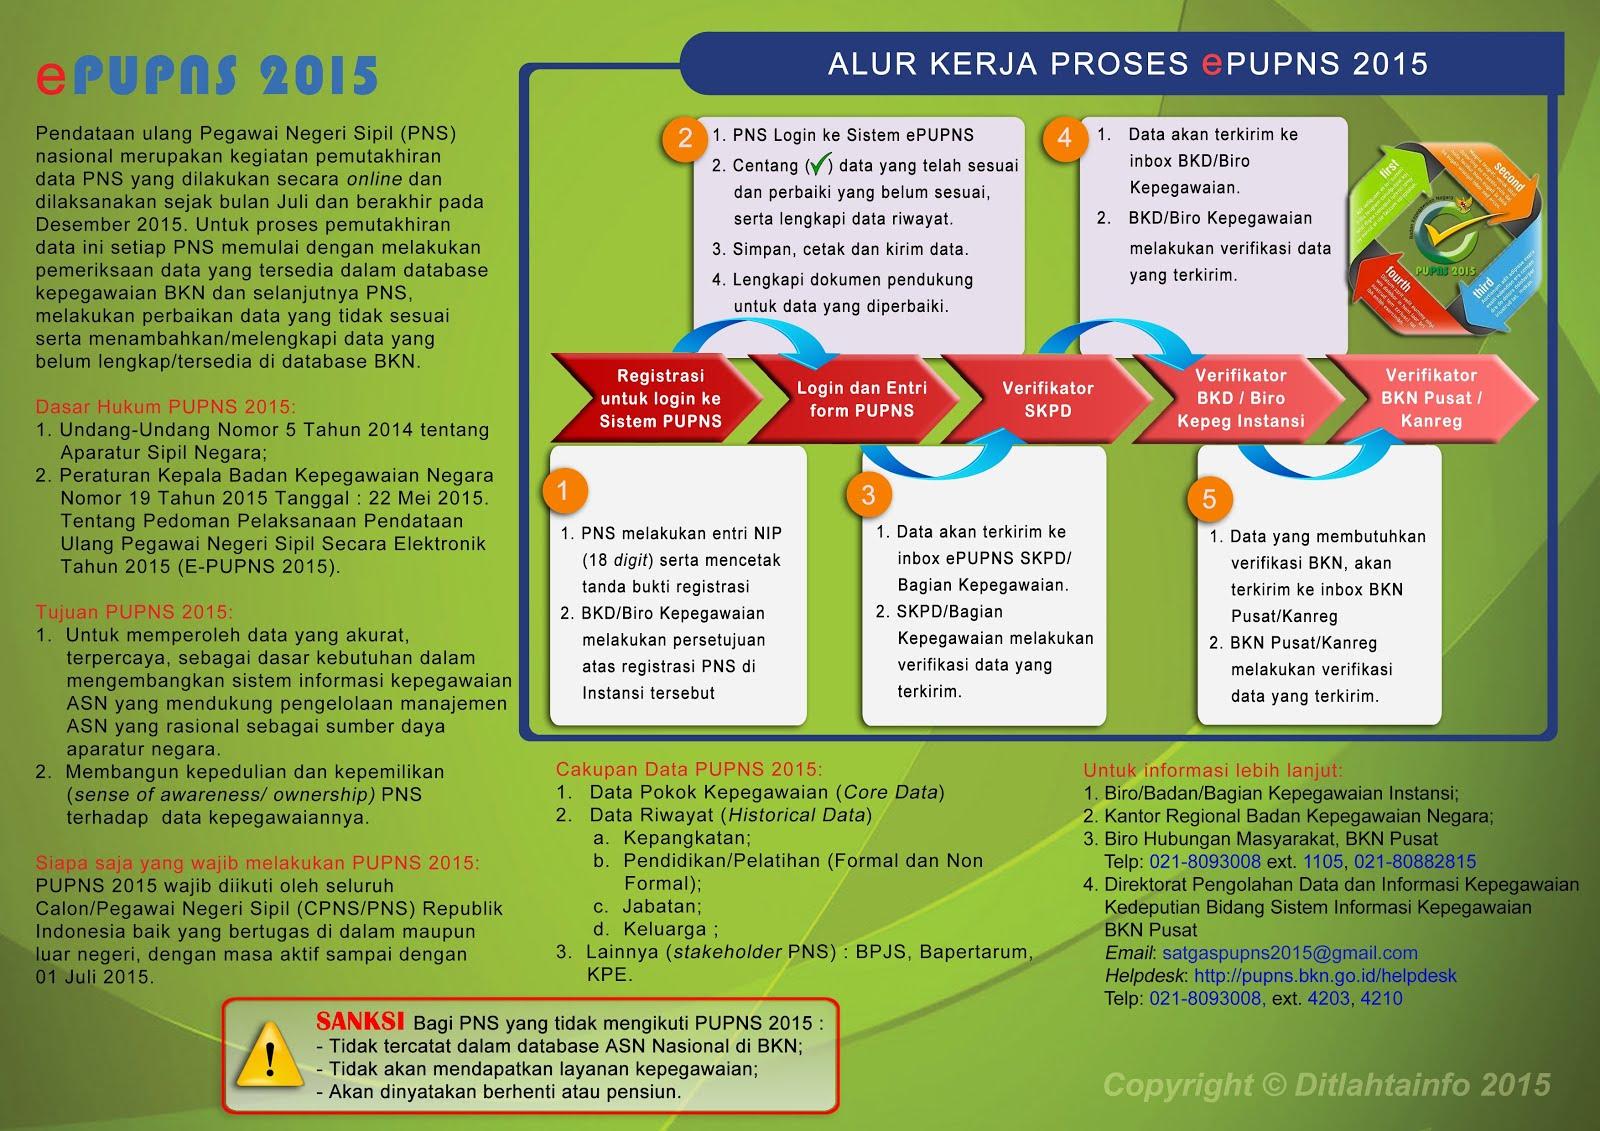 GAMBAR ALUR URUTAN PENGISIAN DATA PUPNS 2015